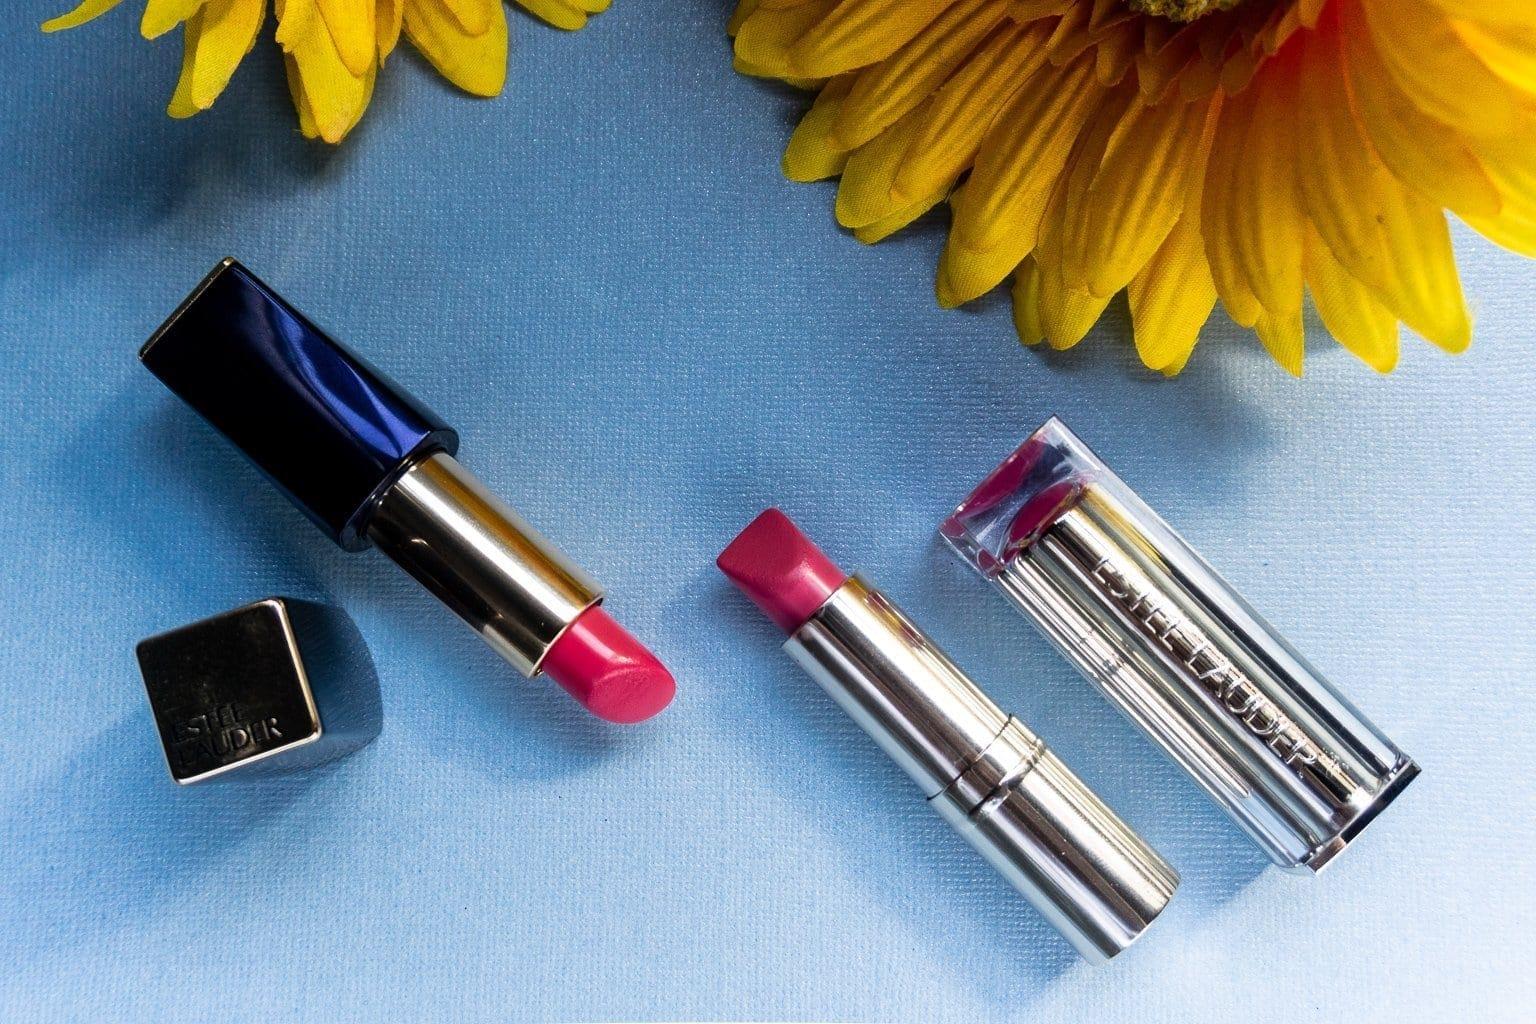 Estee Lauder Lipsticks Don't Smell Like You Remember